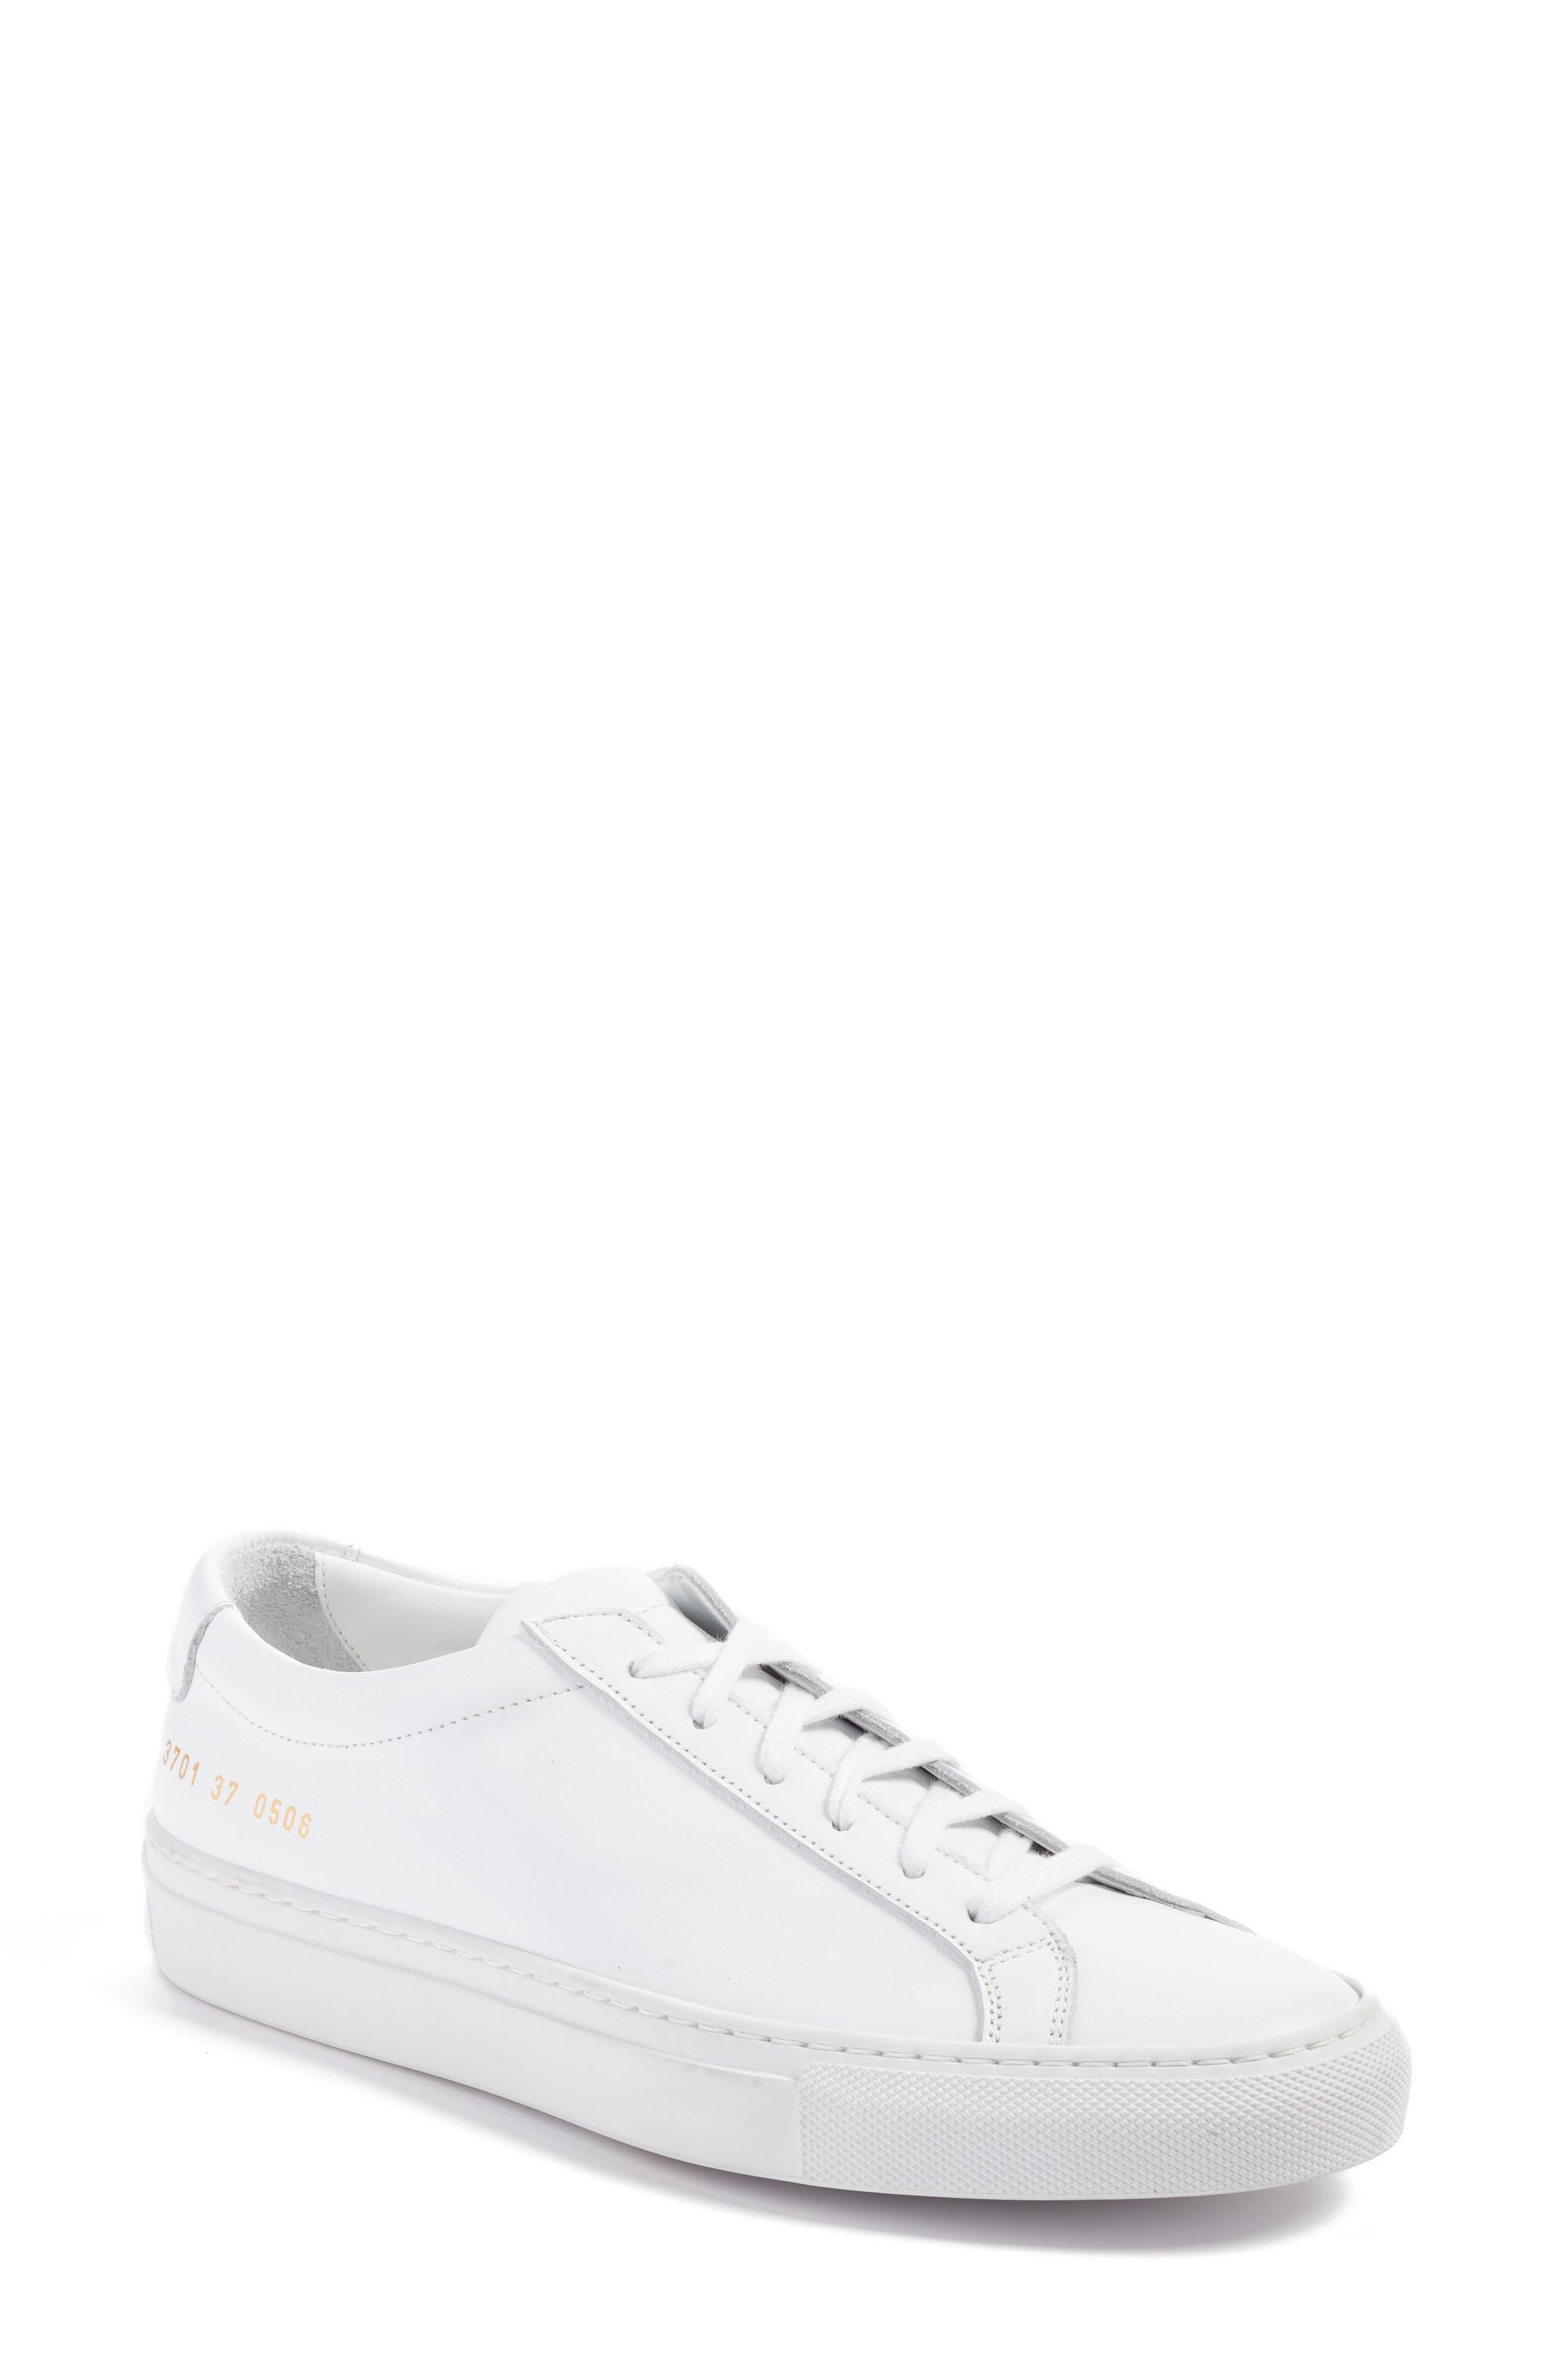 COMMON PROJECTS Original Achilles Sneaker, Main, color, WHITE LEATHER